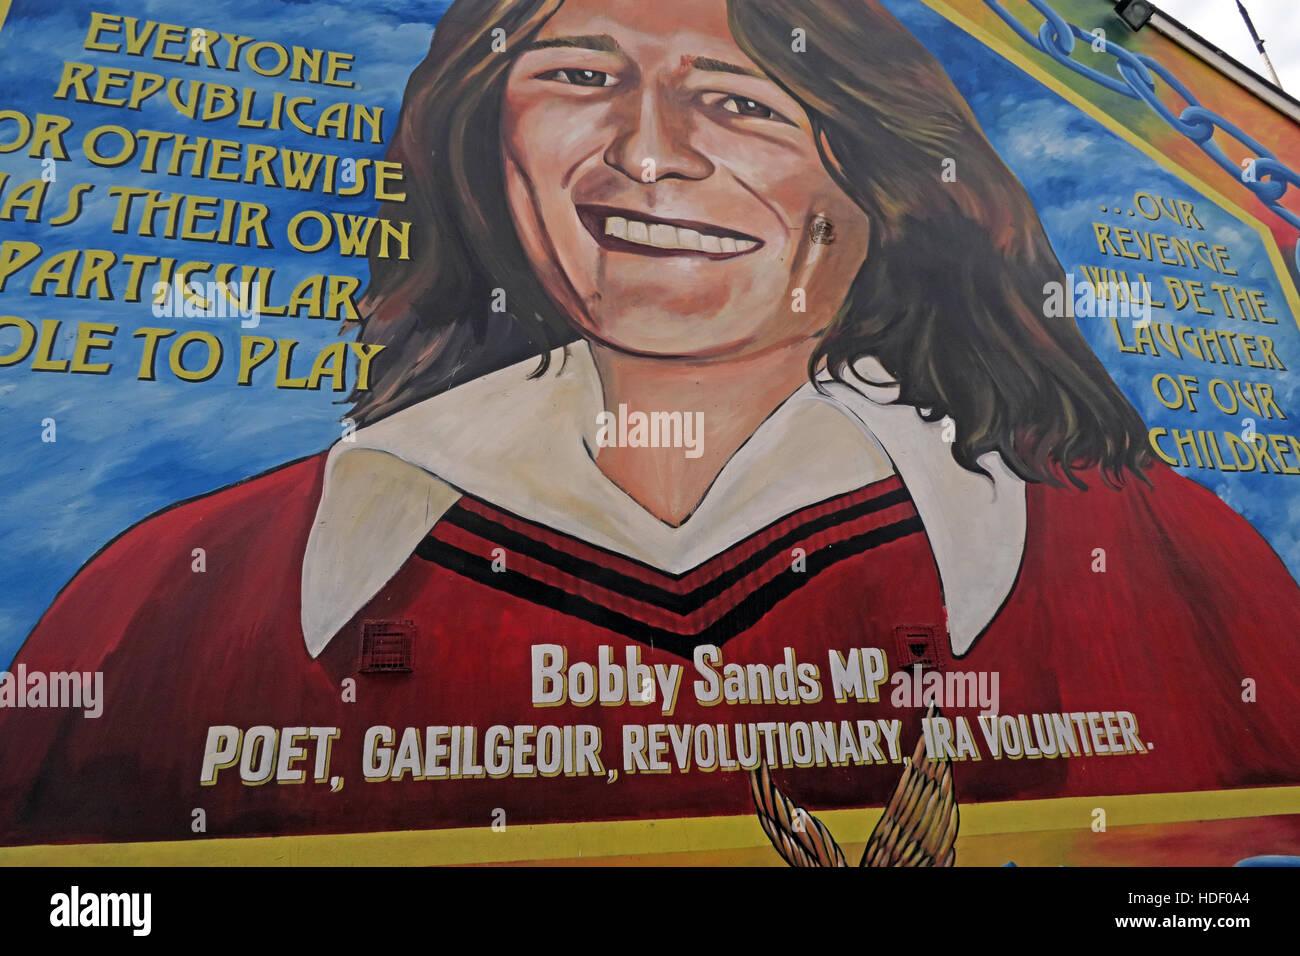 Laden Sie dieses Alamy Stockfoto Alle Republikaner. Belfast fällt Rd Wandbild-Bobby Sands MP, Dichter, Gaeilgeoir, revolutionär, IRA Volunteer - HDF0A4